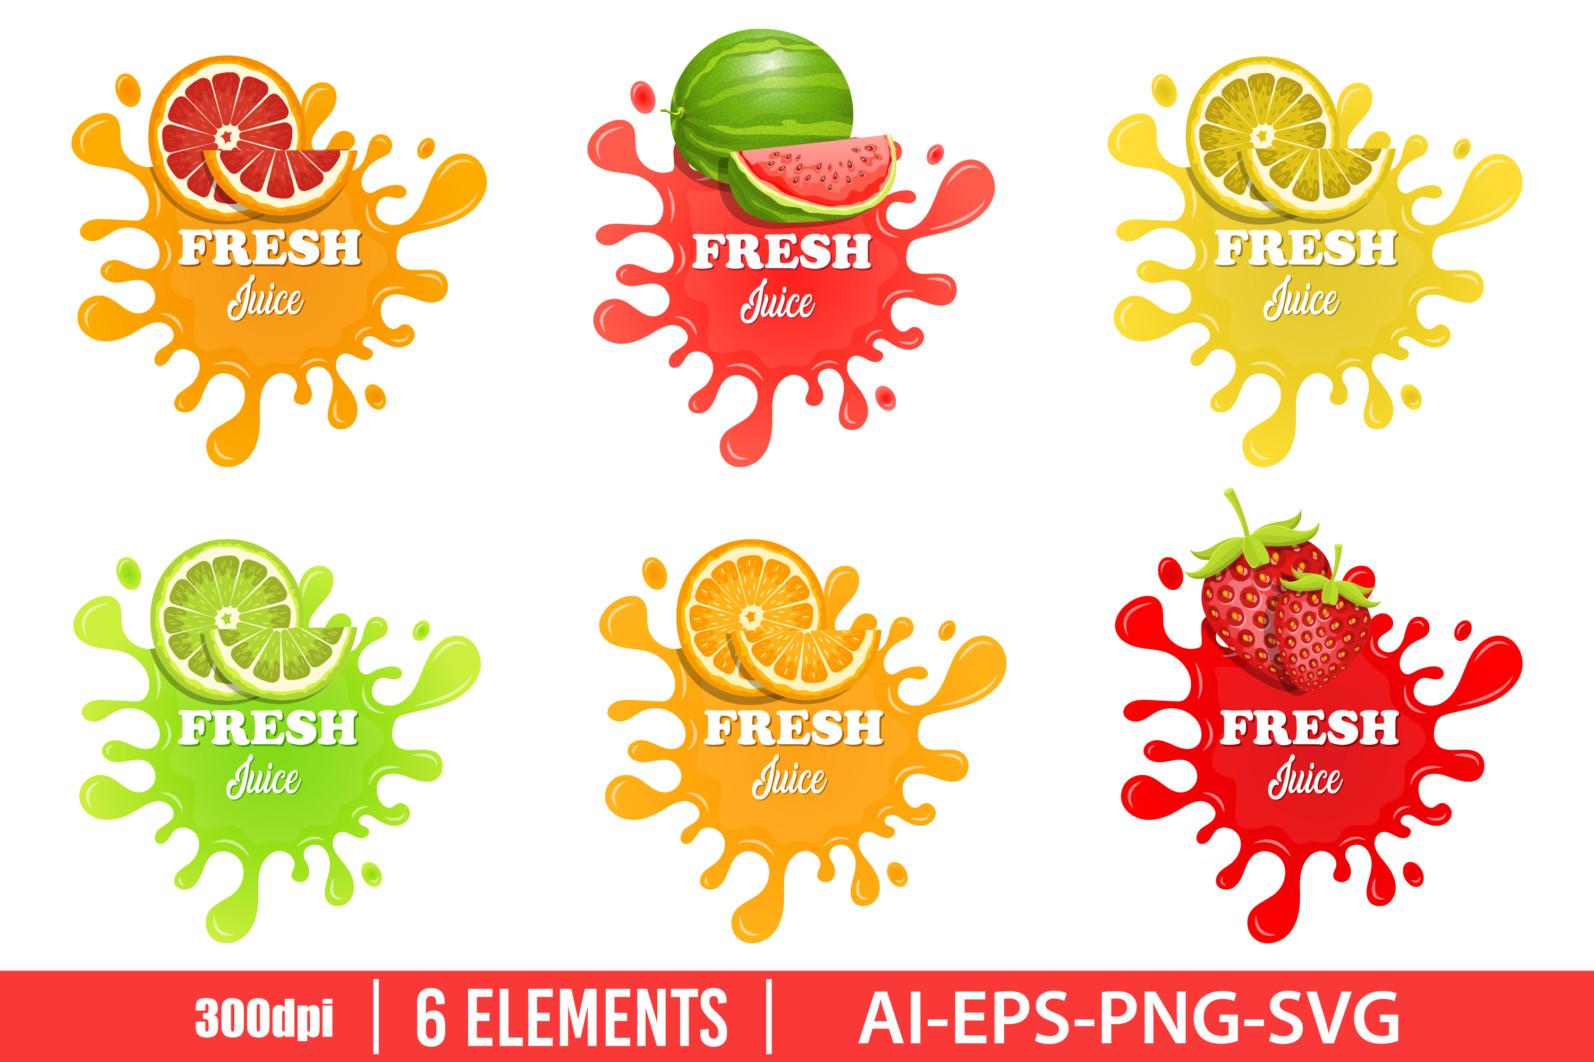 Fruit juice splashes clipart vector design illustration. Juice splashes set. Vector Clipart Print - FRUIT JUICE SPLATTER scaled -